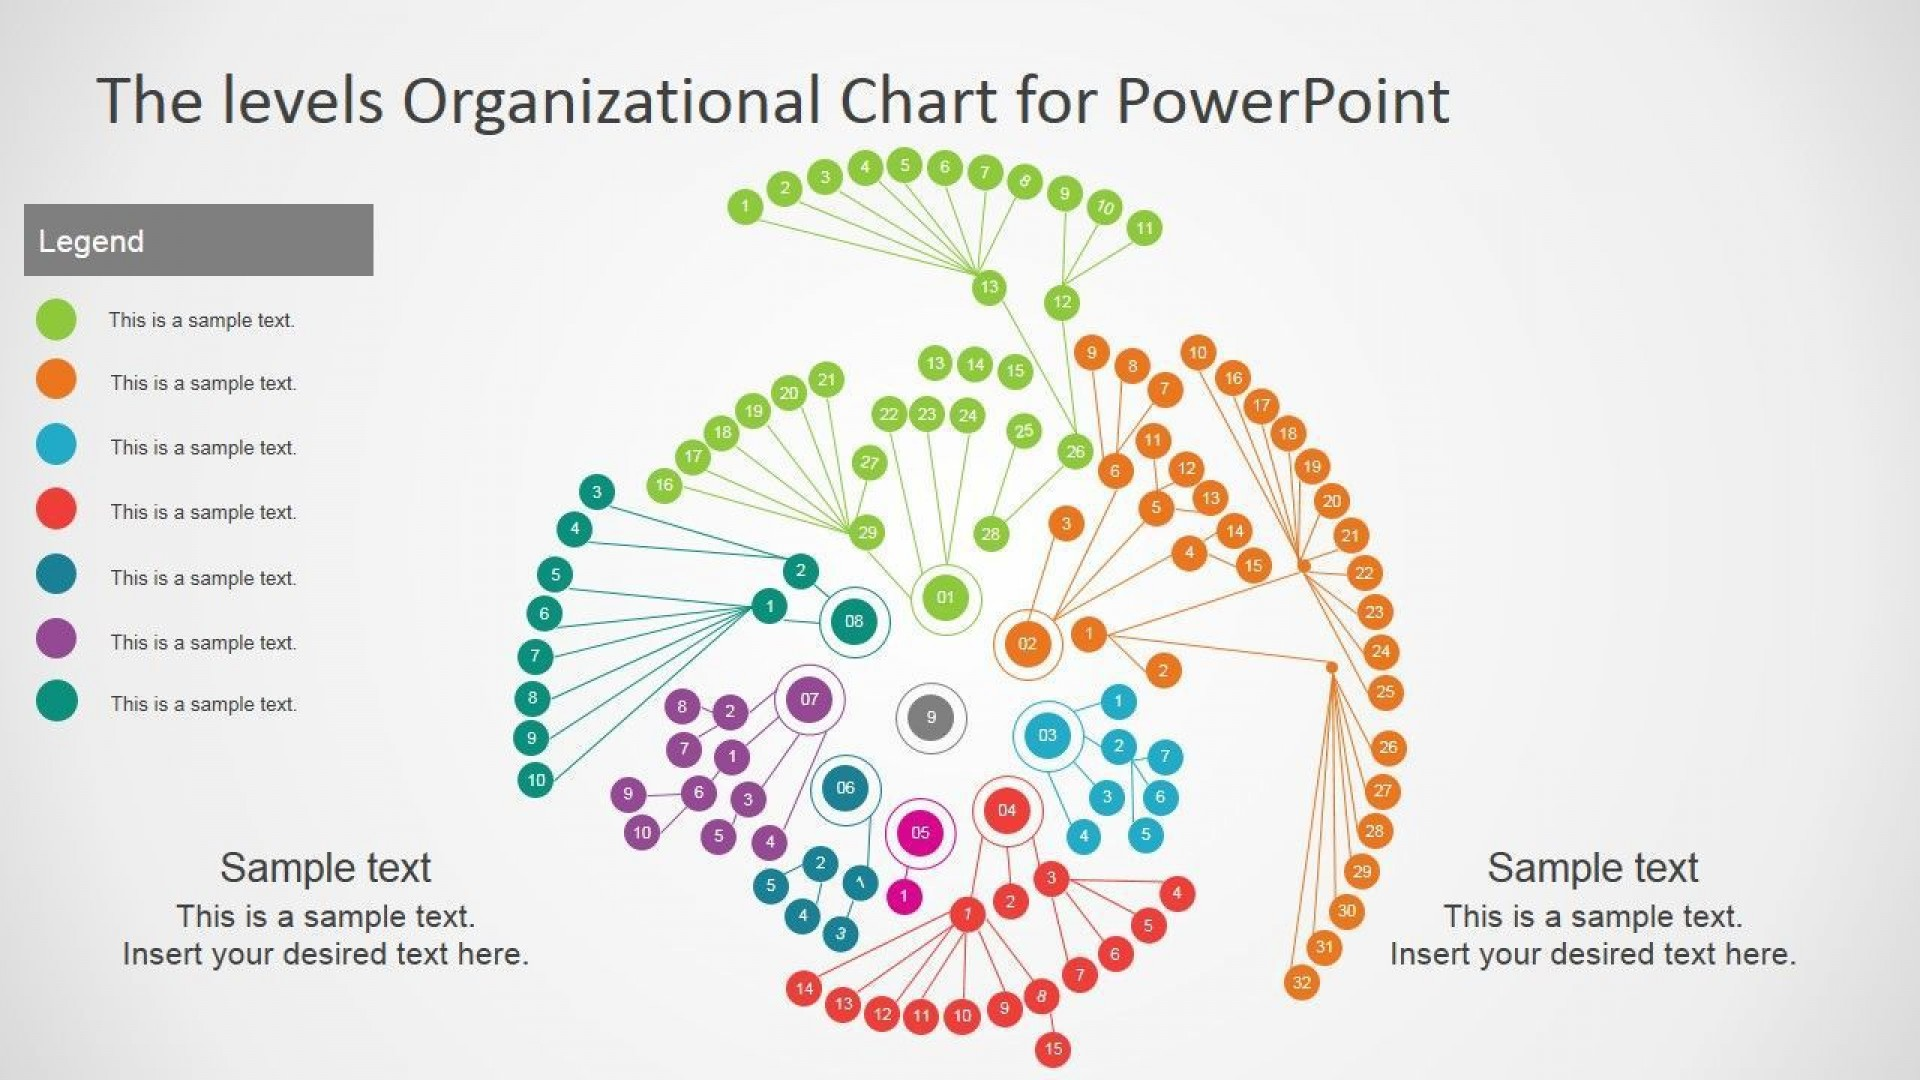 002 Remarkable Microsoft Visio Organization Chart Template High Resolution  Org1920